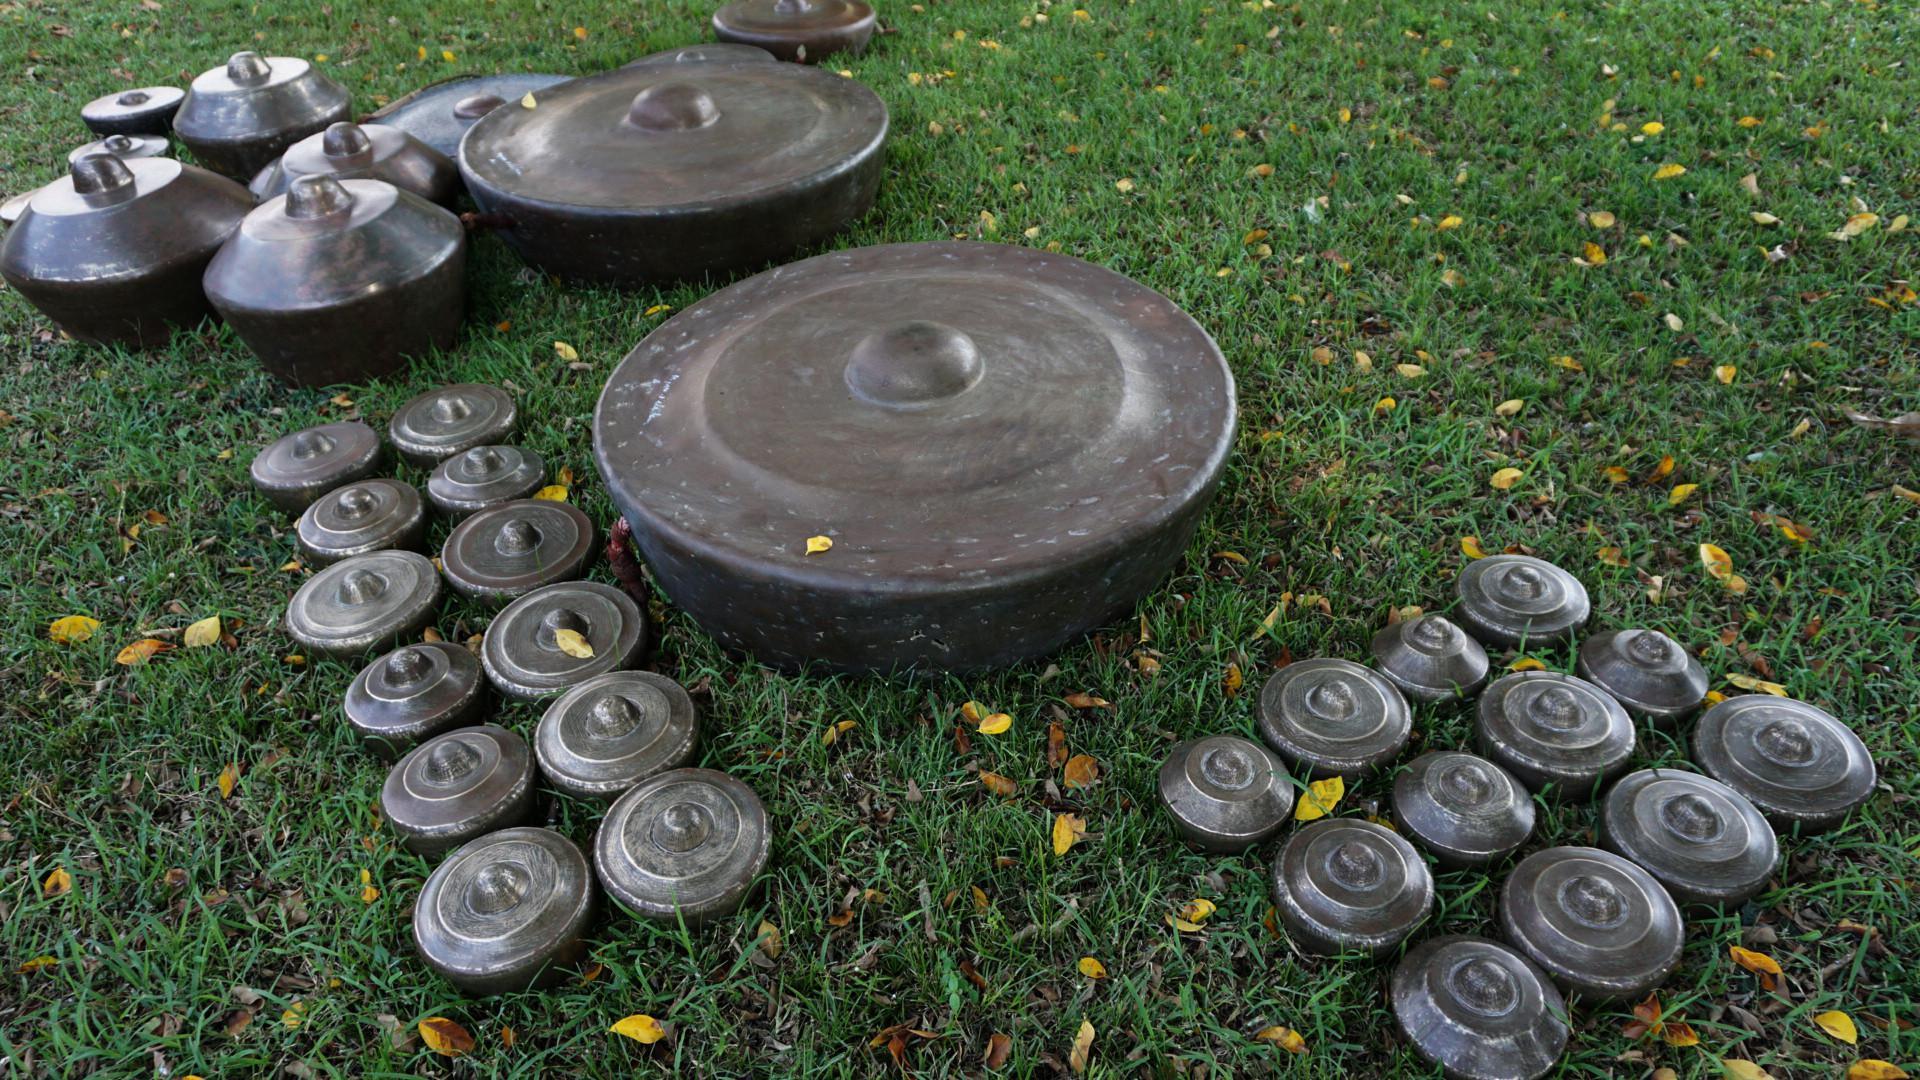 Tradisi membersihkan gamelan pusaka di Pura Mangkunegaran, Solo, Jawa Tengah, sudah menjadi ritual sejak Mangkunegara V. (Liputan6.com/Fajar Abrori)